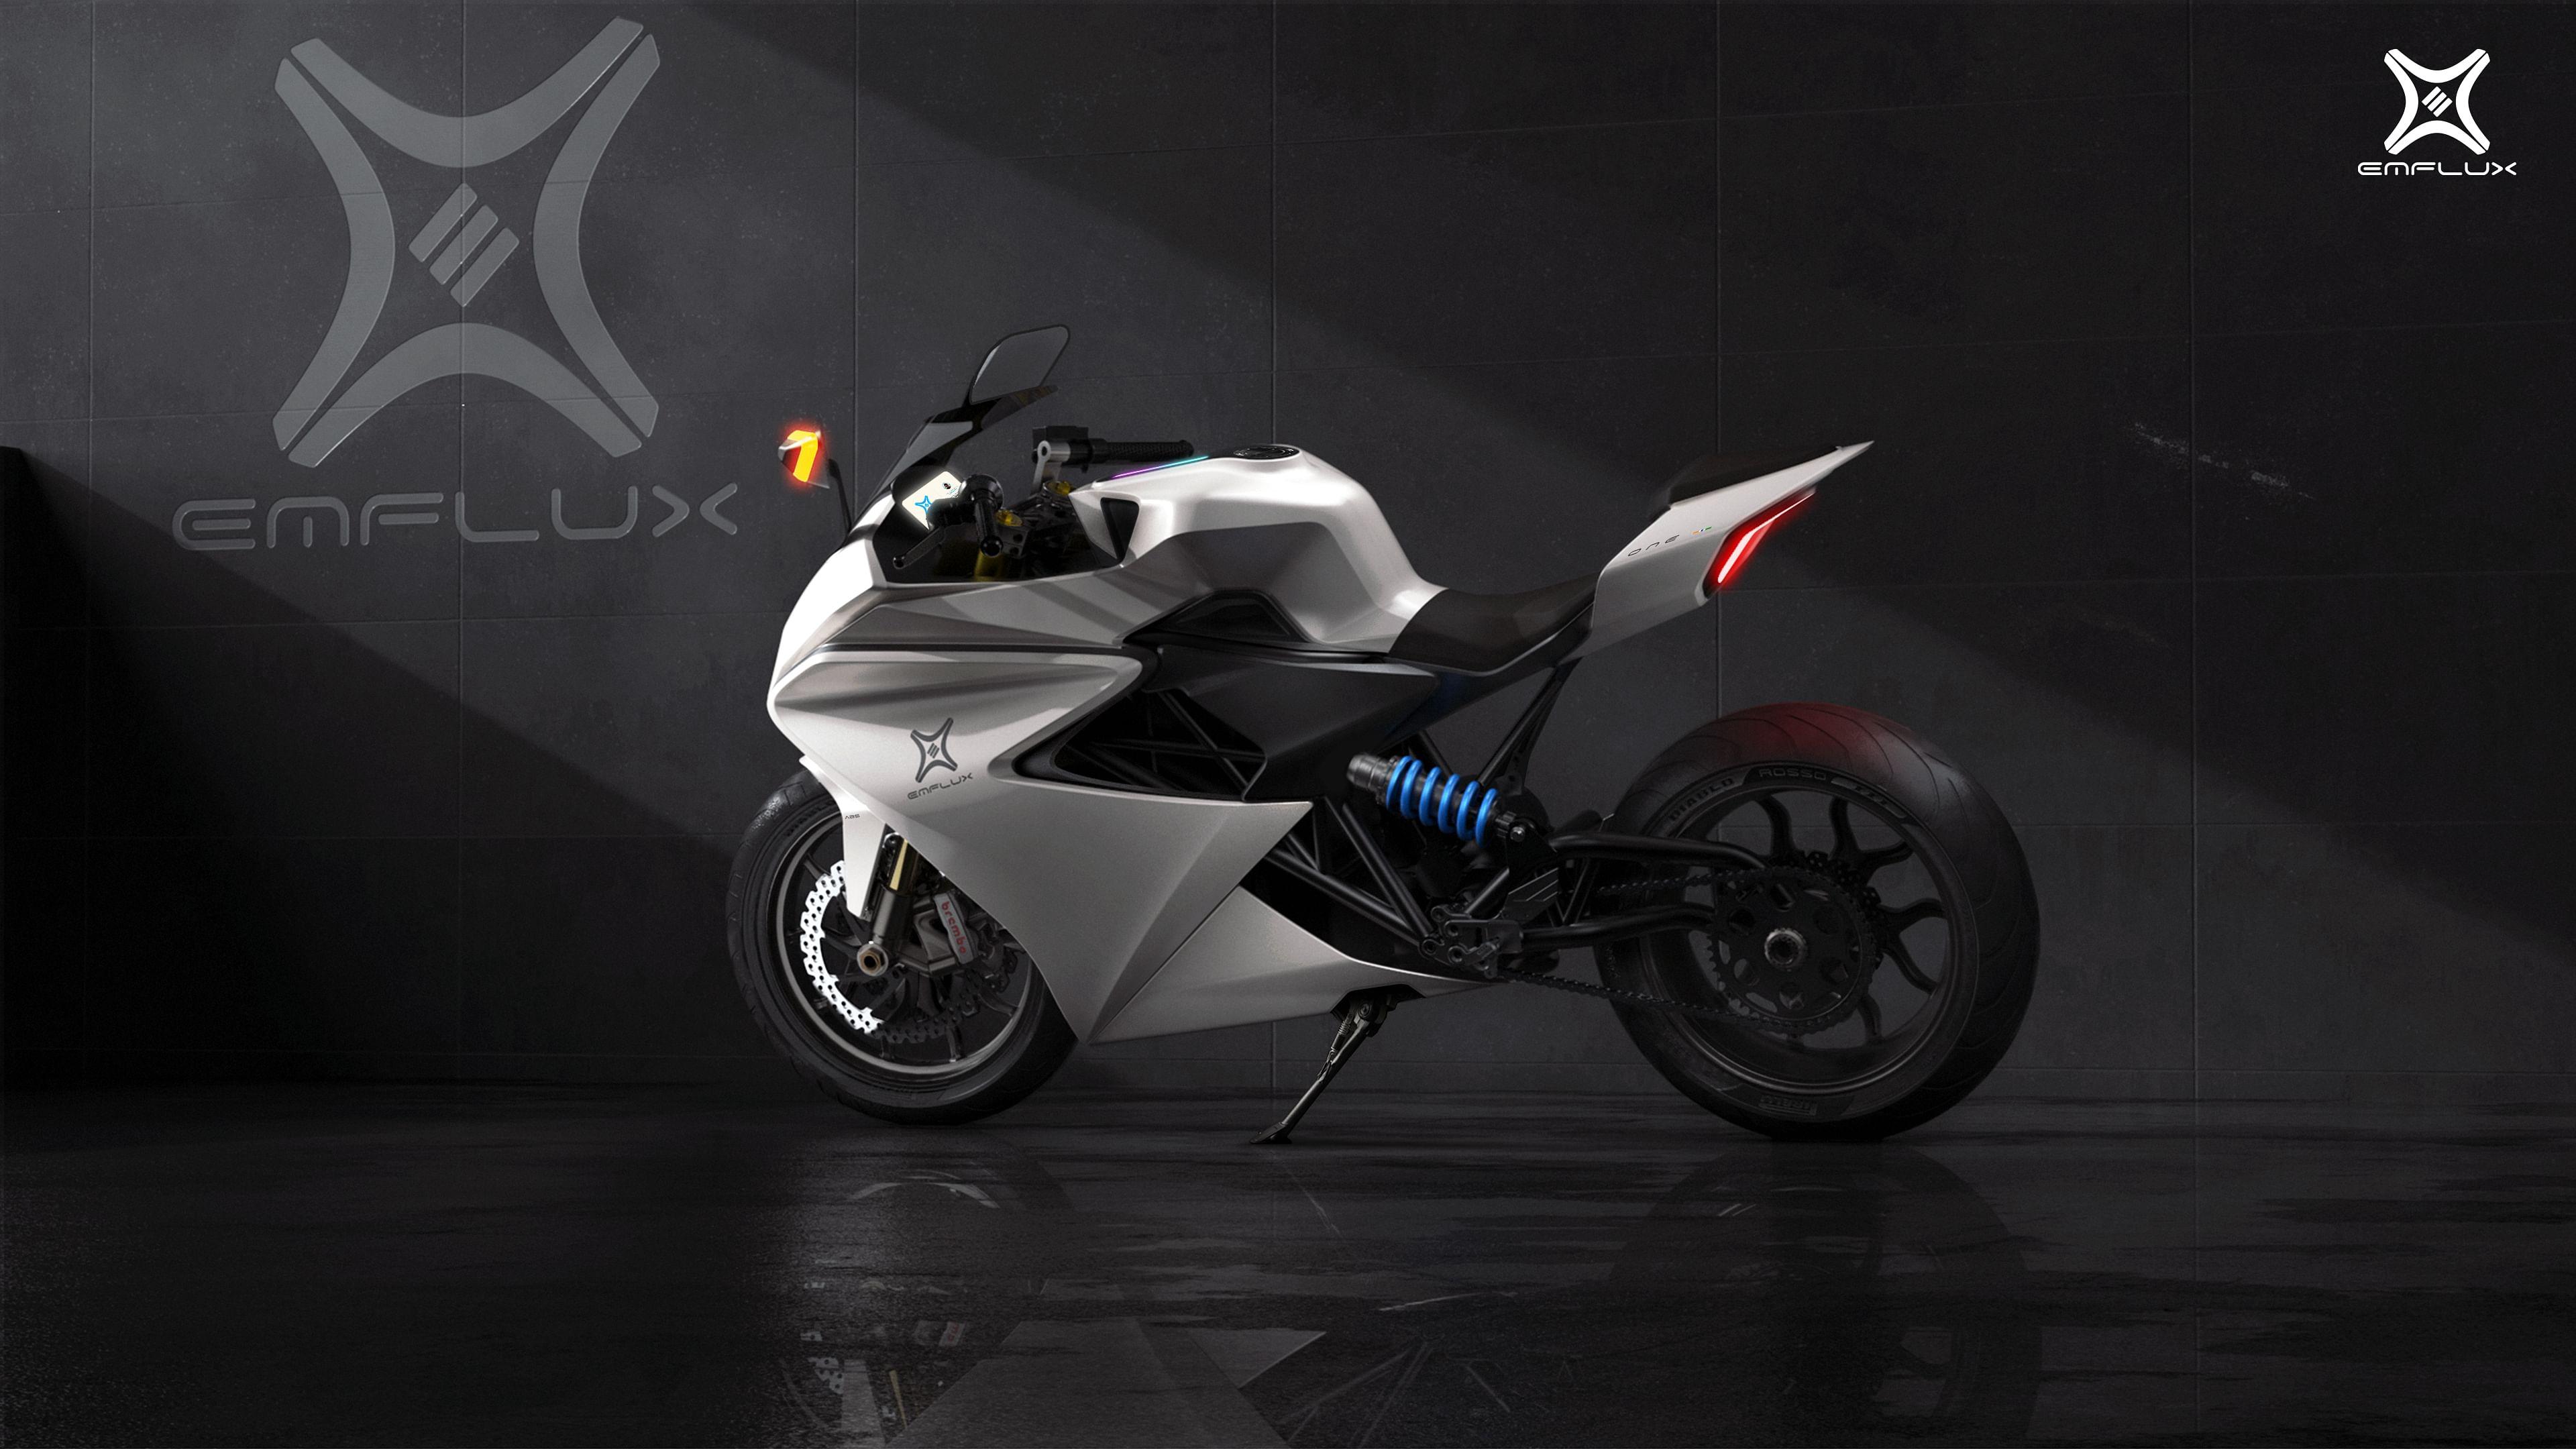 Emflux ONE (Source: Emflux Motors)